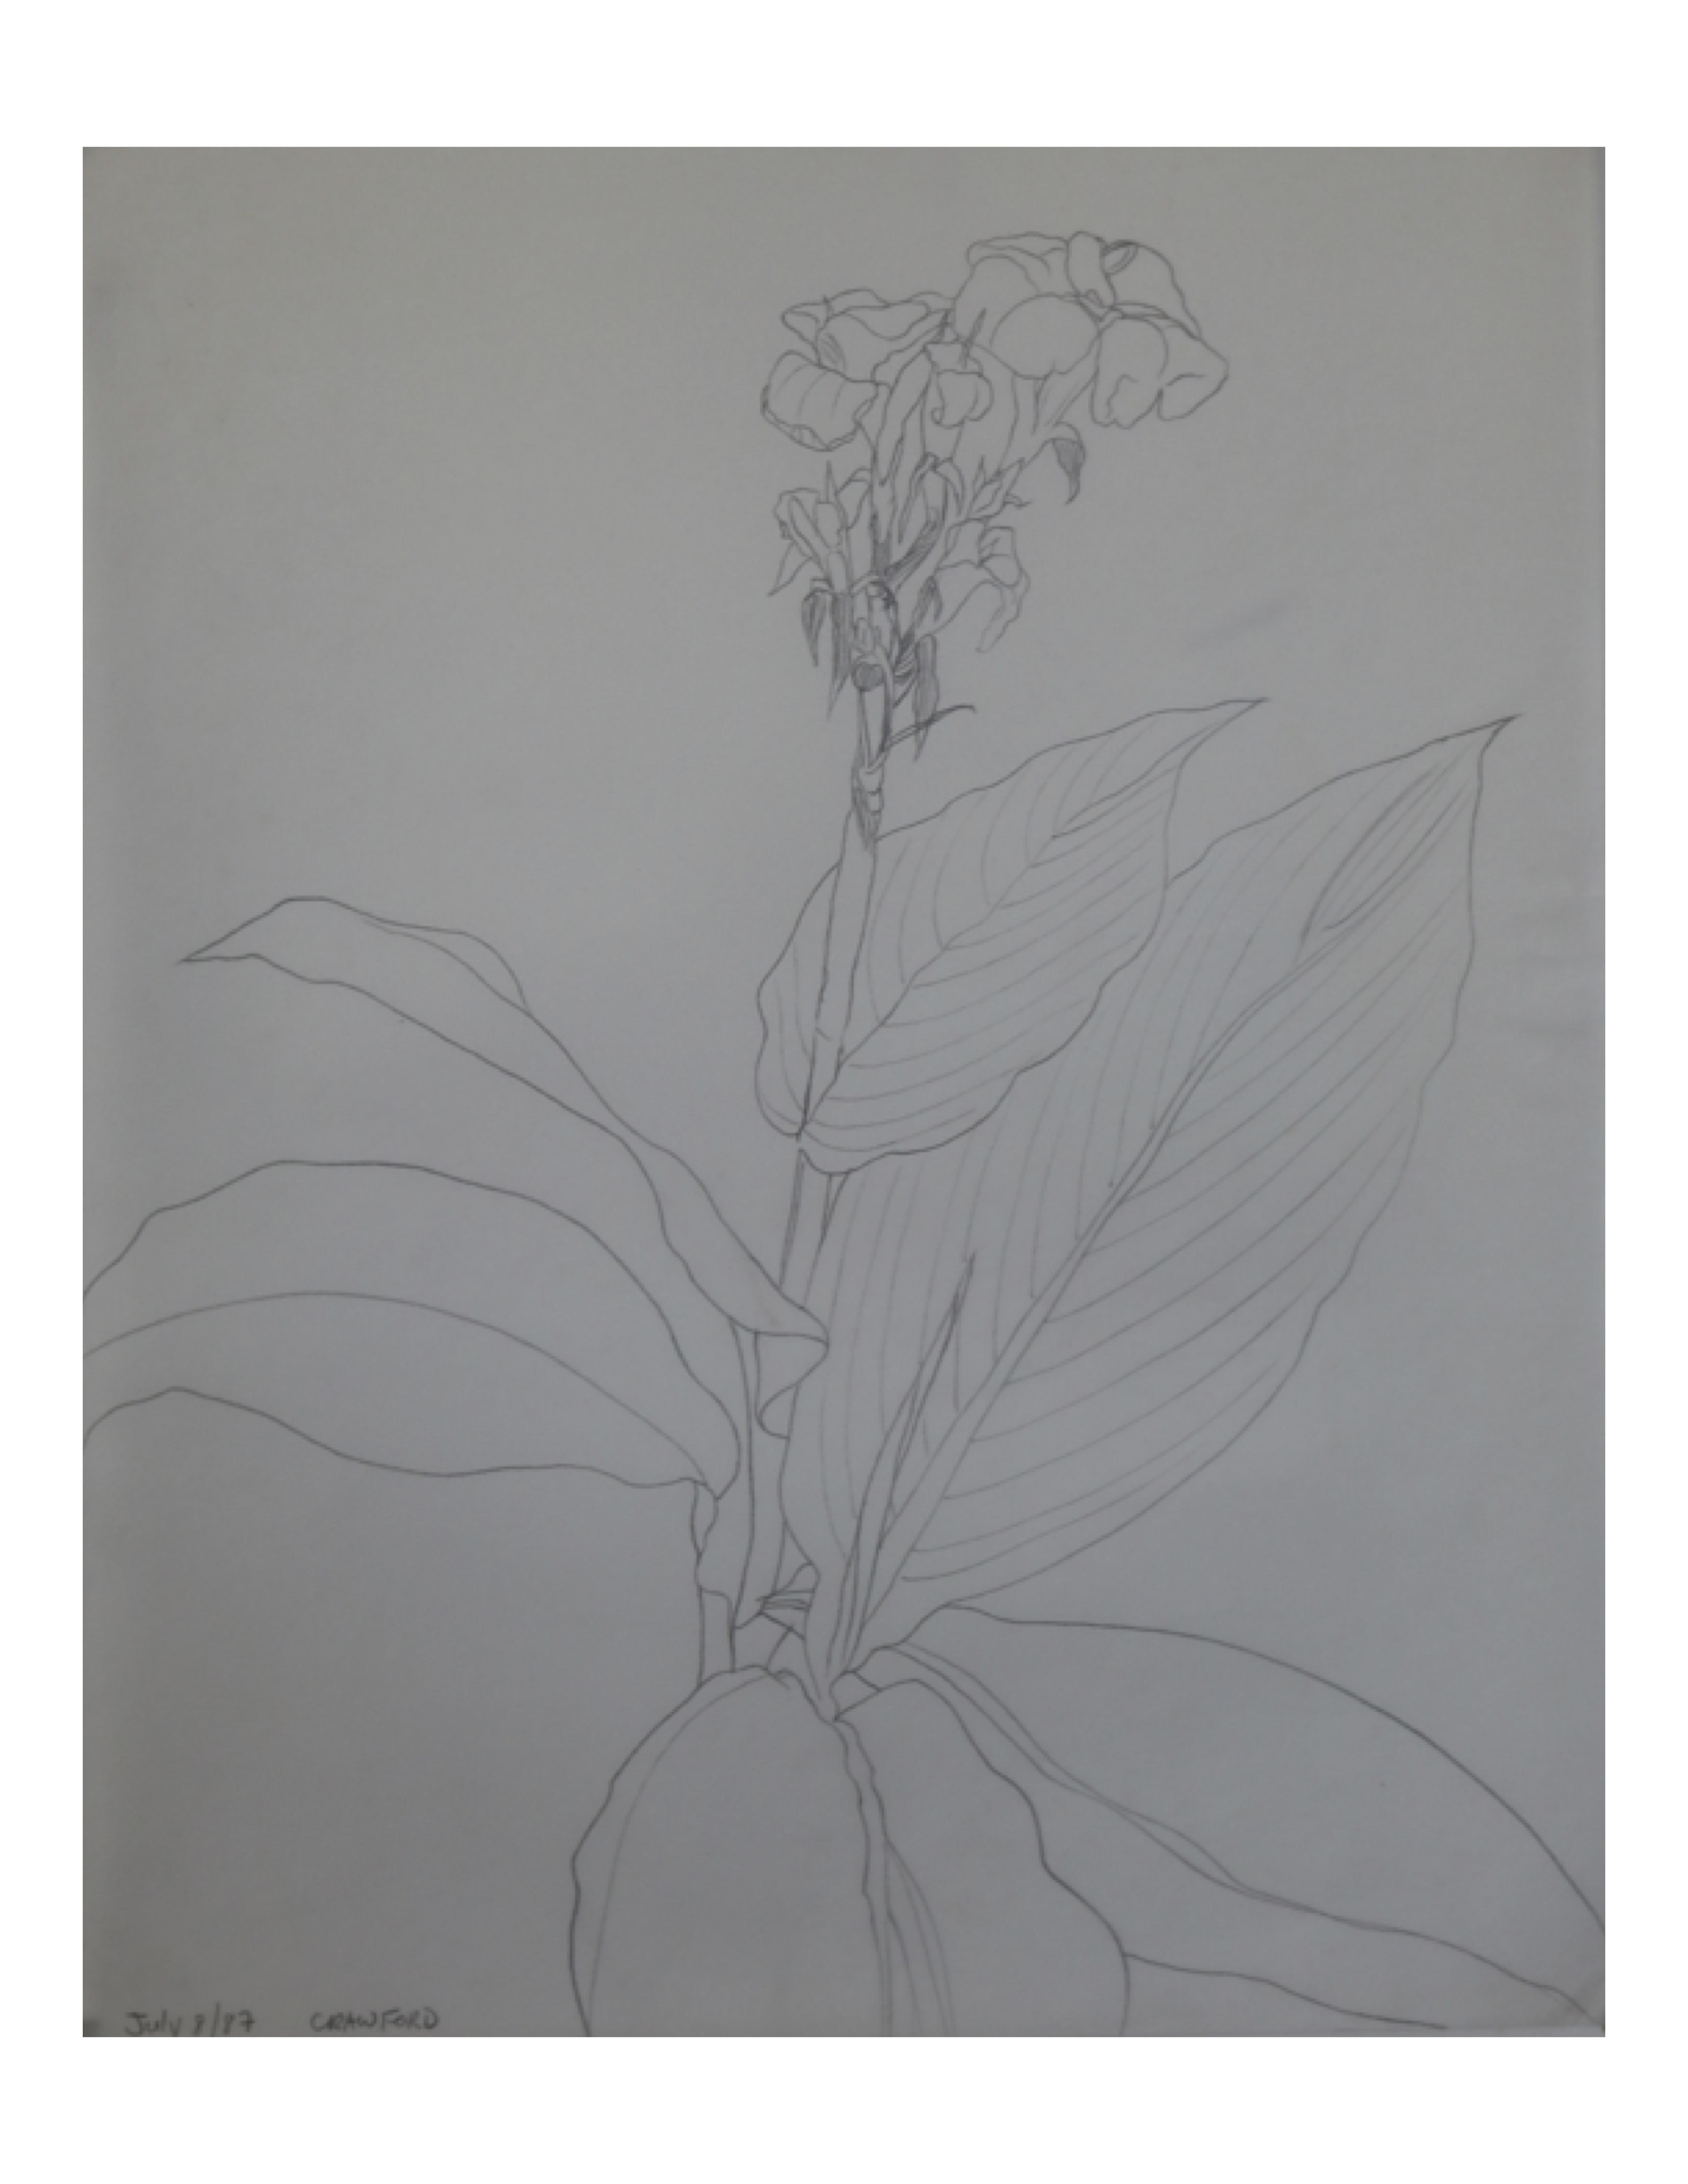 Canna lily Pakistan garden 2, July 8, 1987, pencil on paper, 27.8 cm x 35.5 cm